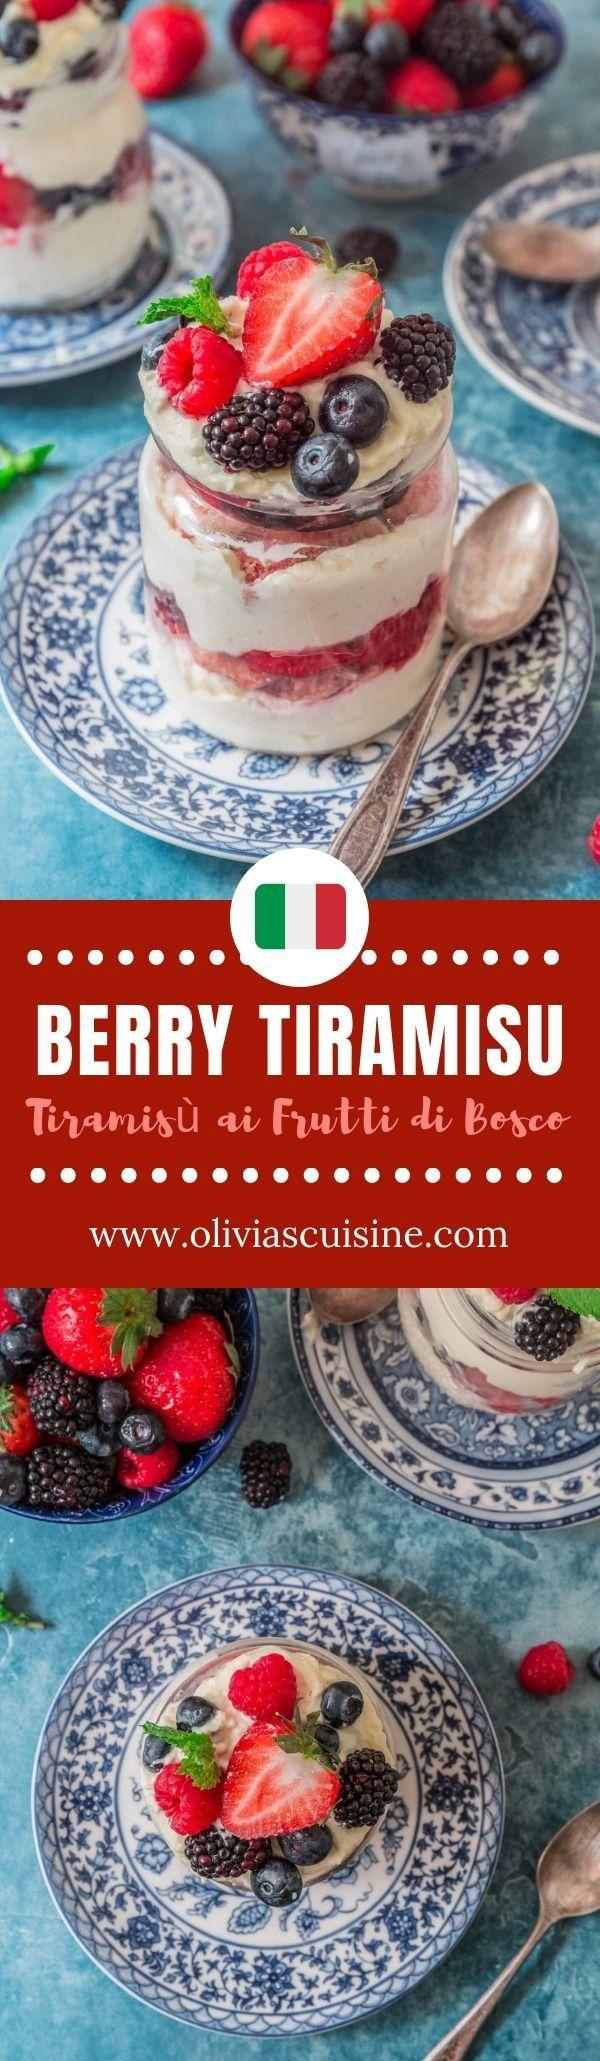 Berry Tiramisu Www Oliviascuisine Com A Summery Twist On The Classic Tiramisu This Berry Tiramisu Tiramisu Ai Frut Dessert Recipes Wine Desserts Desserts